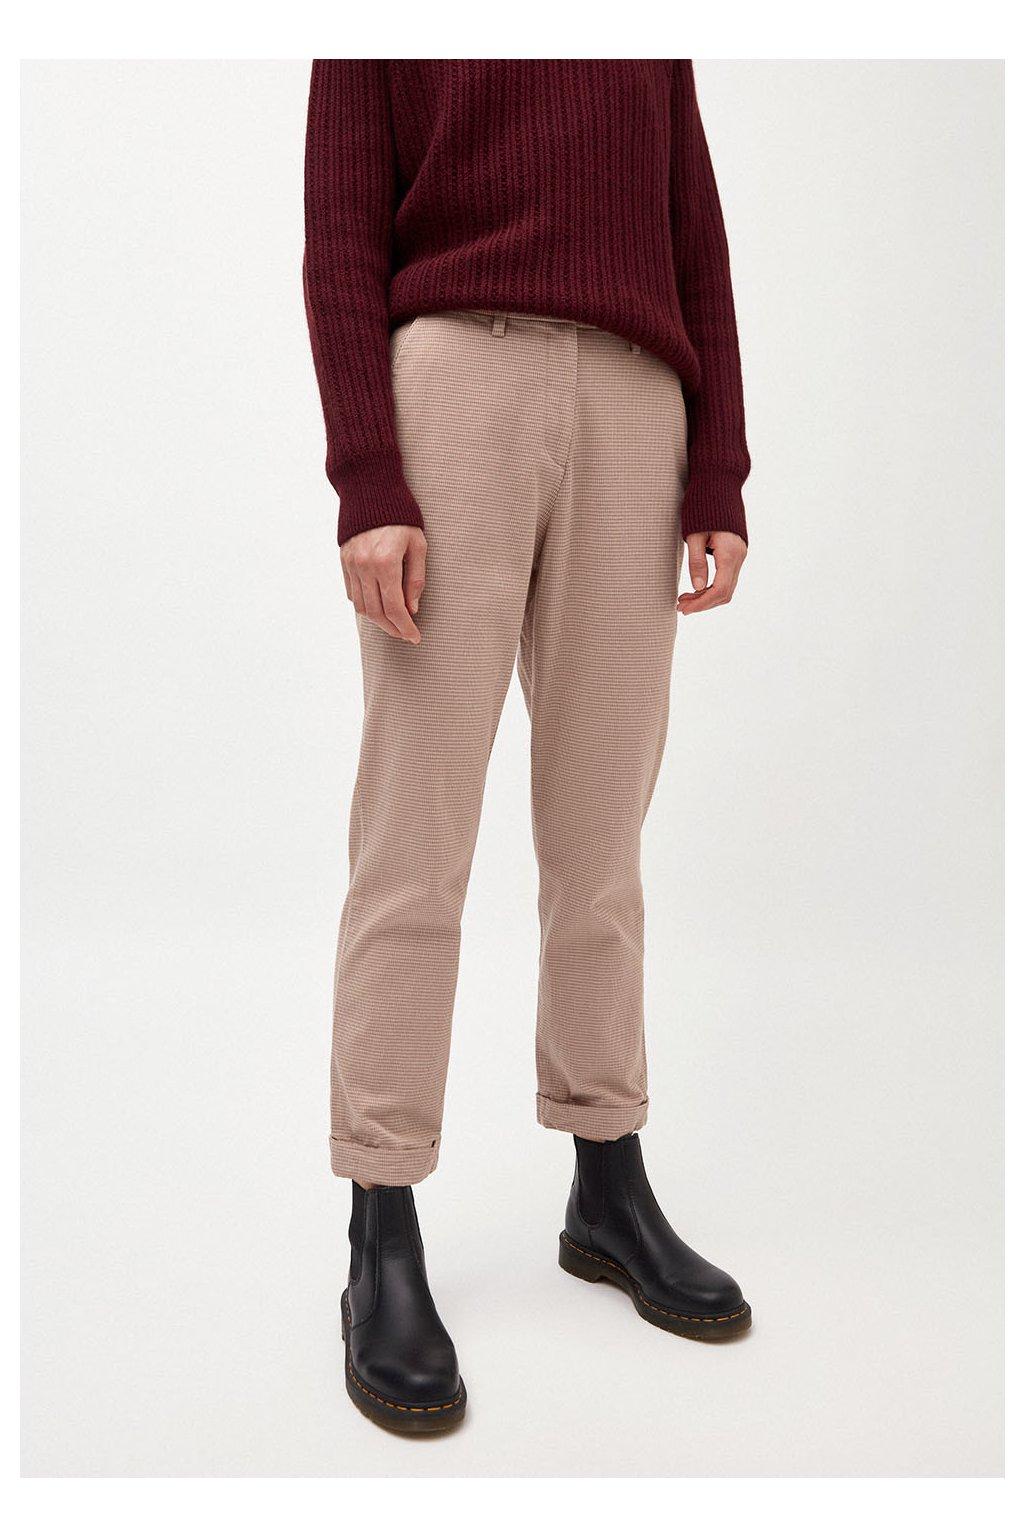 "Dámské kalhoty se vzorem ""HELLAA dark caramel"" (Velikost L)"